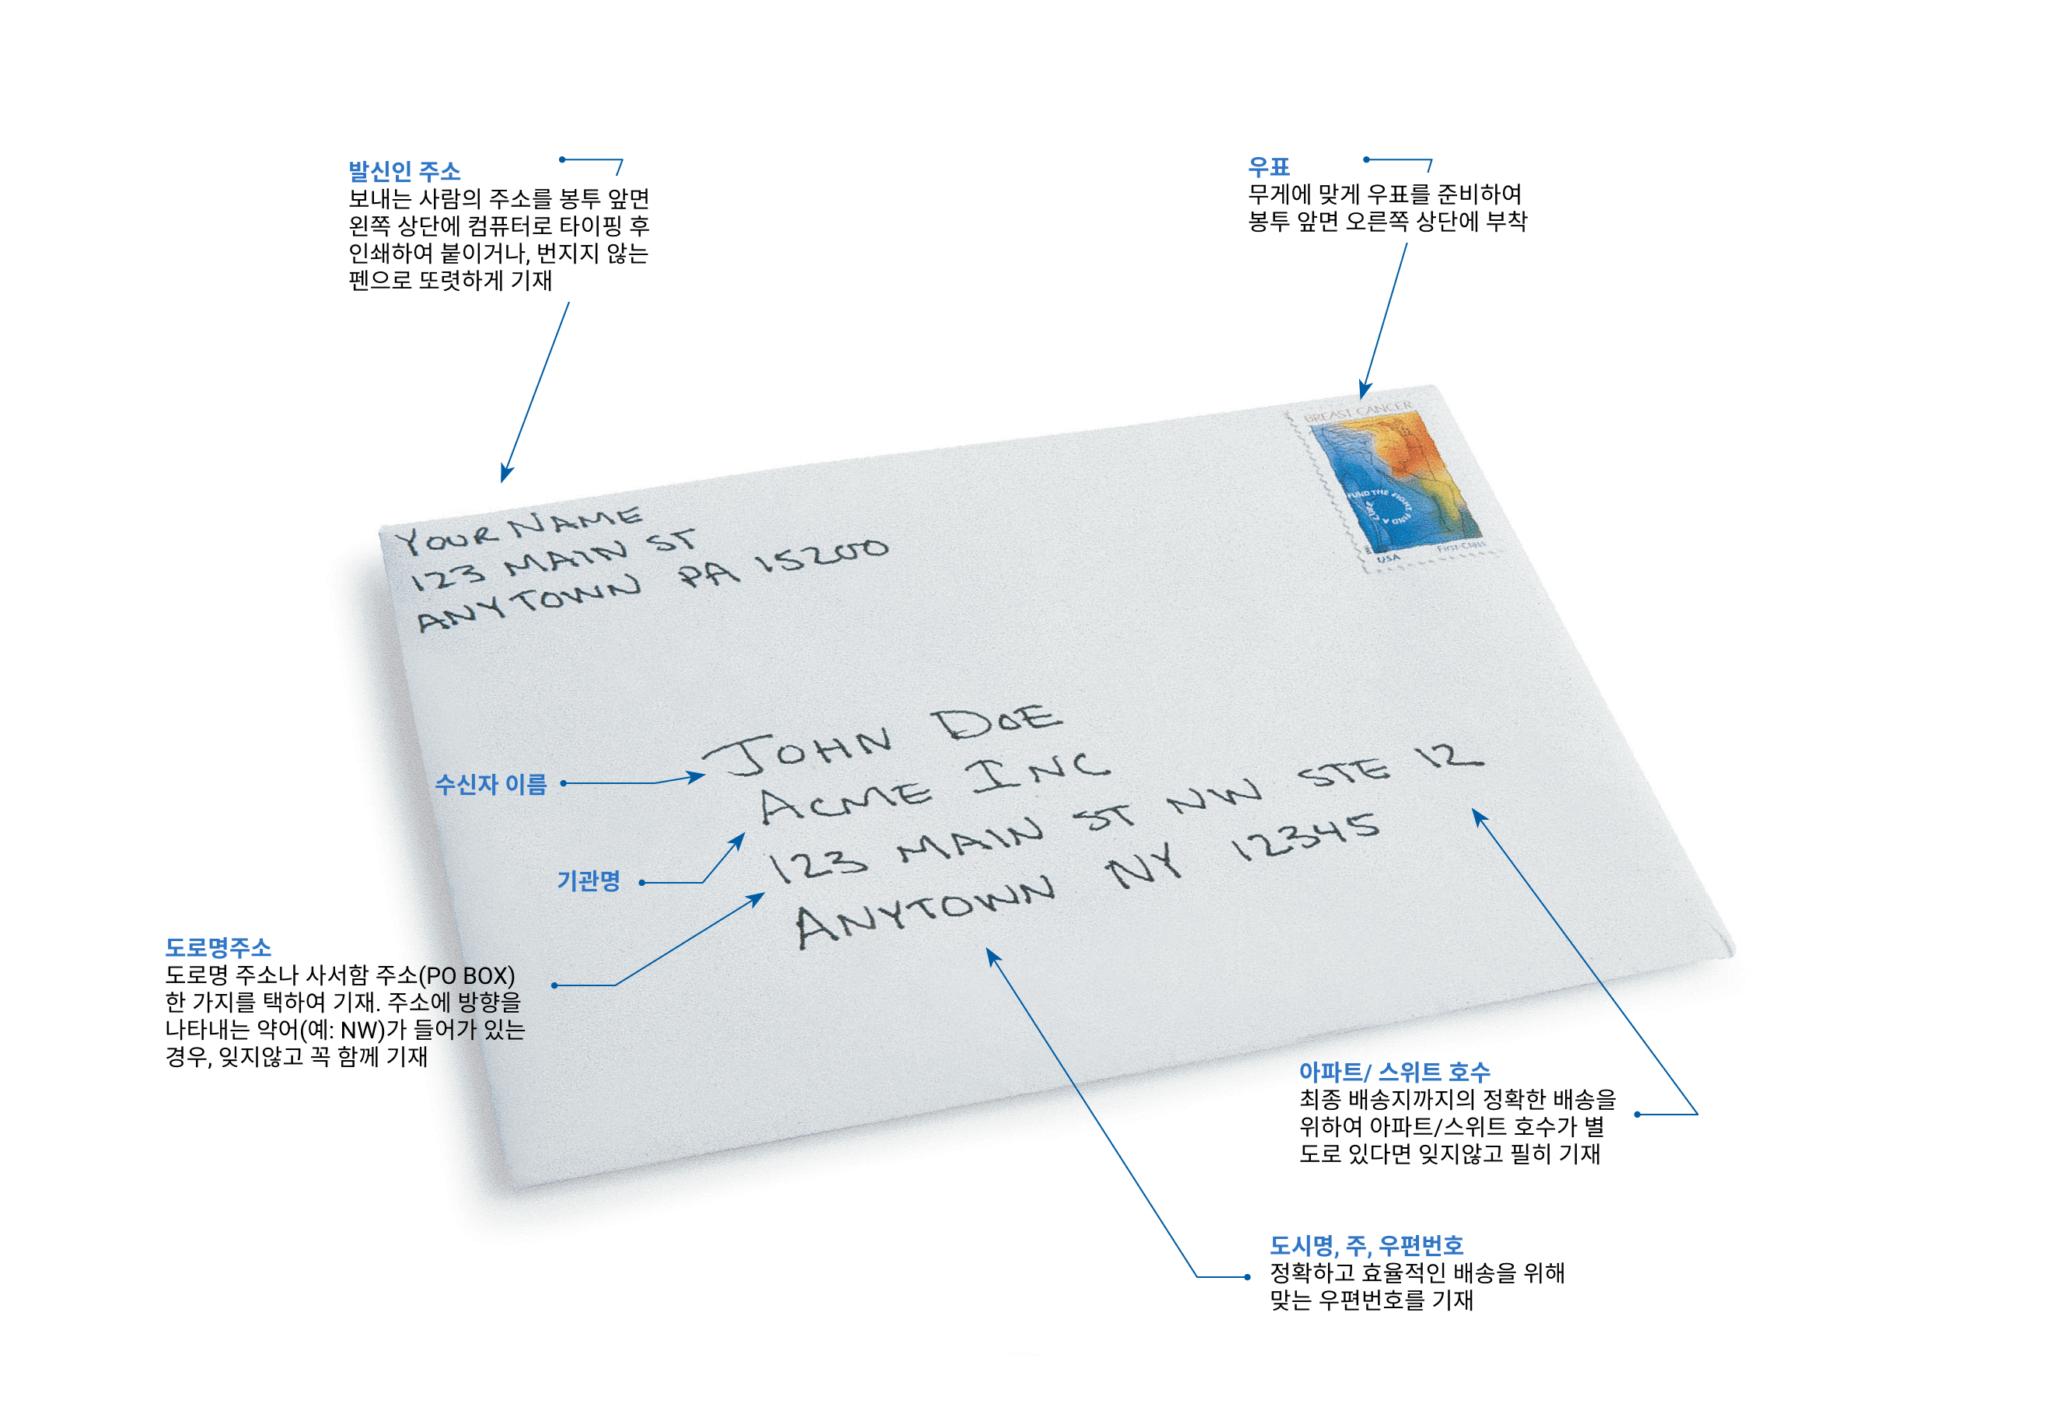 koreaninamericablogtexthowtowriteanaddressonmail